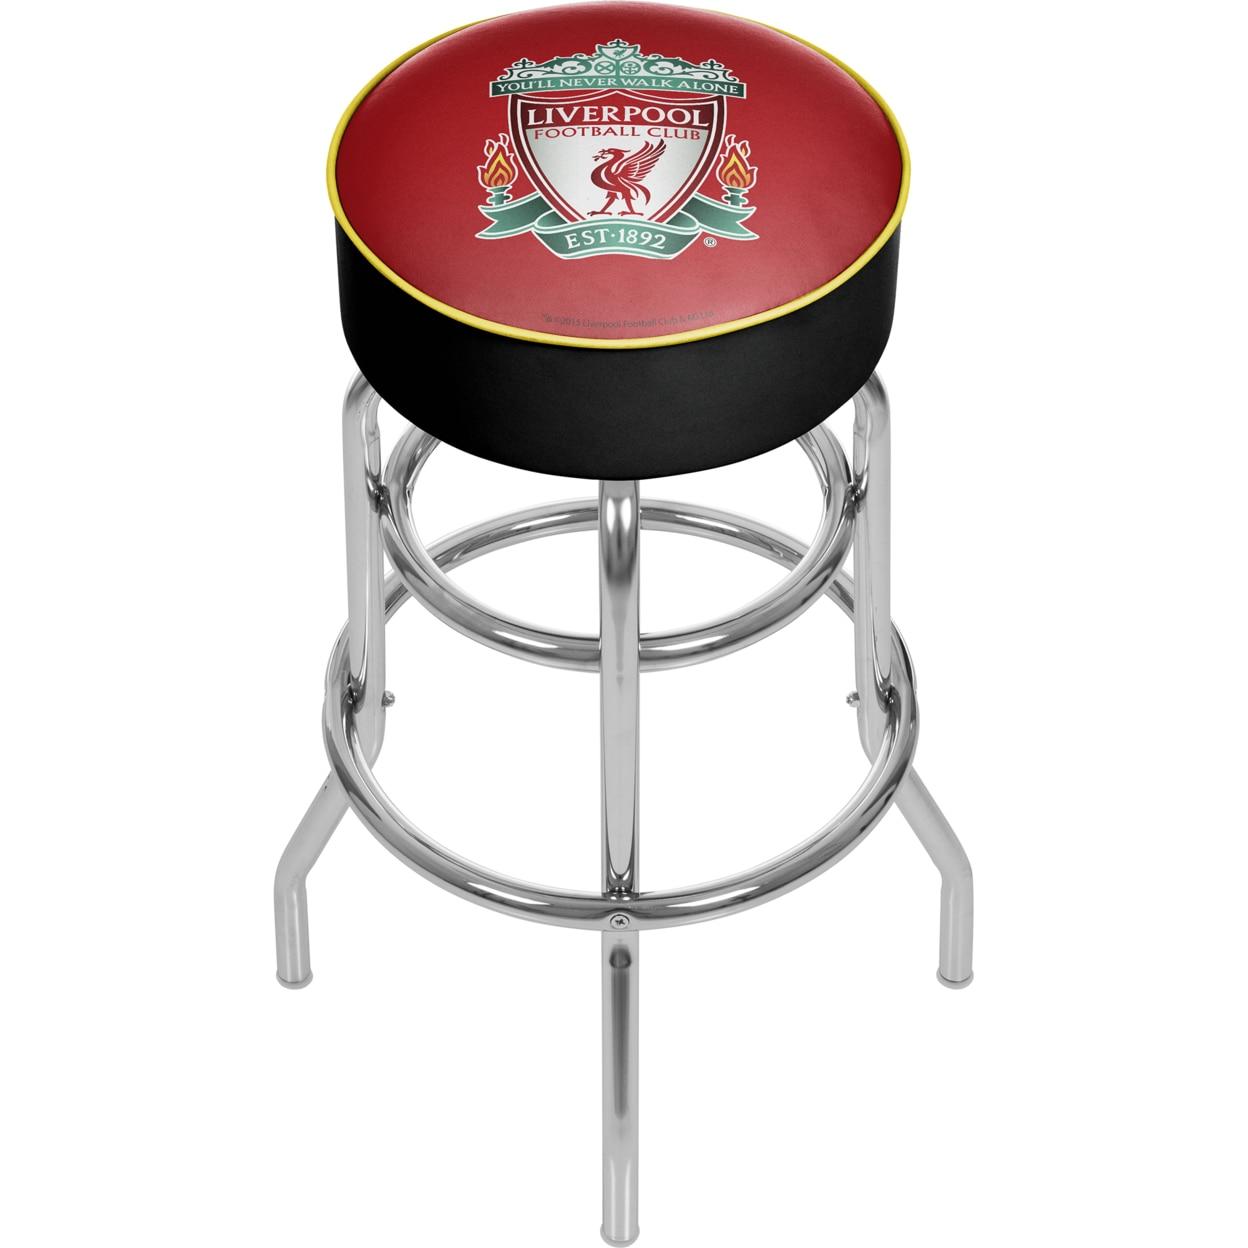 Premier League Liverpool Football Club Chrome Padded Swivel Bar Stool 30 Inches High premier league liverpool football club chrome 42 inch pub table